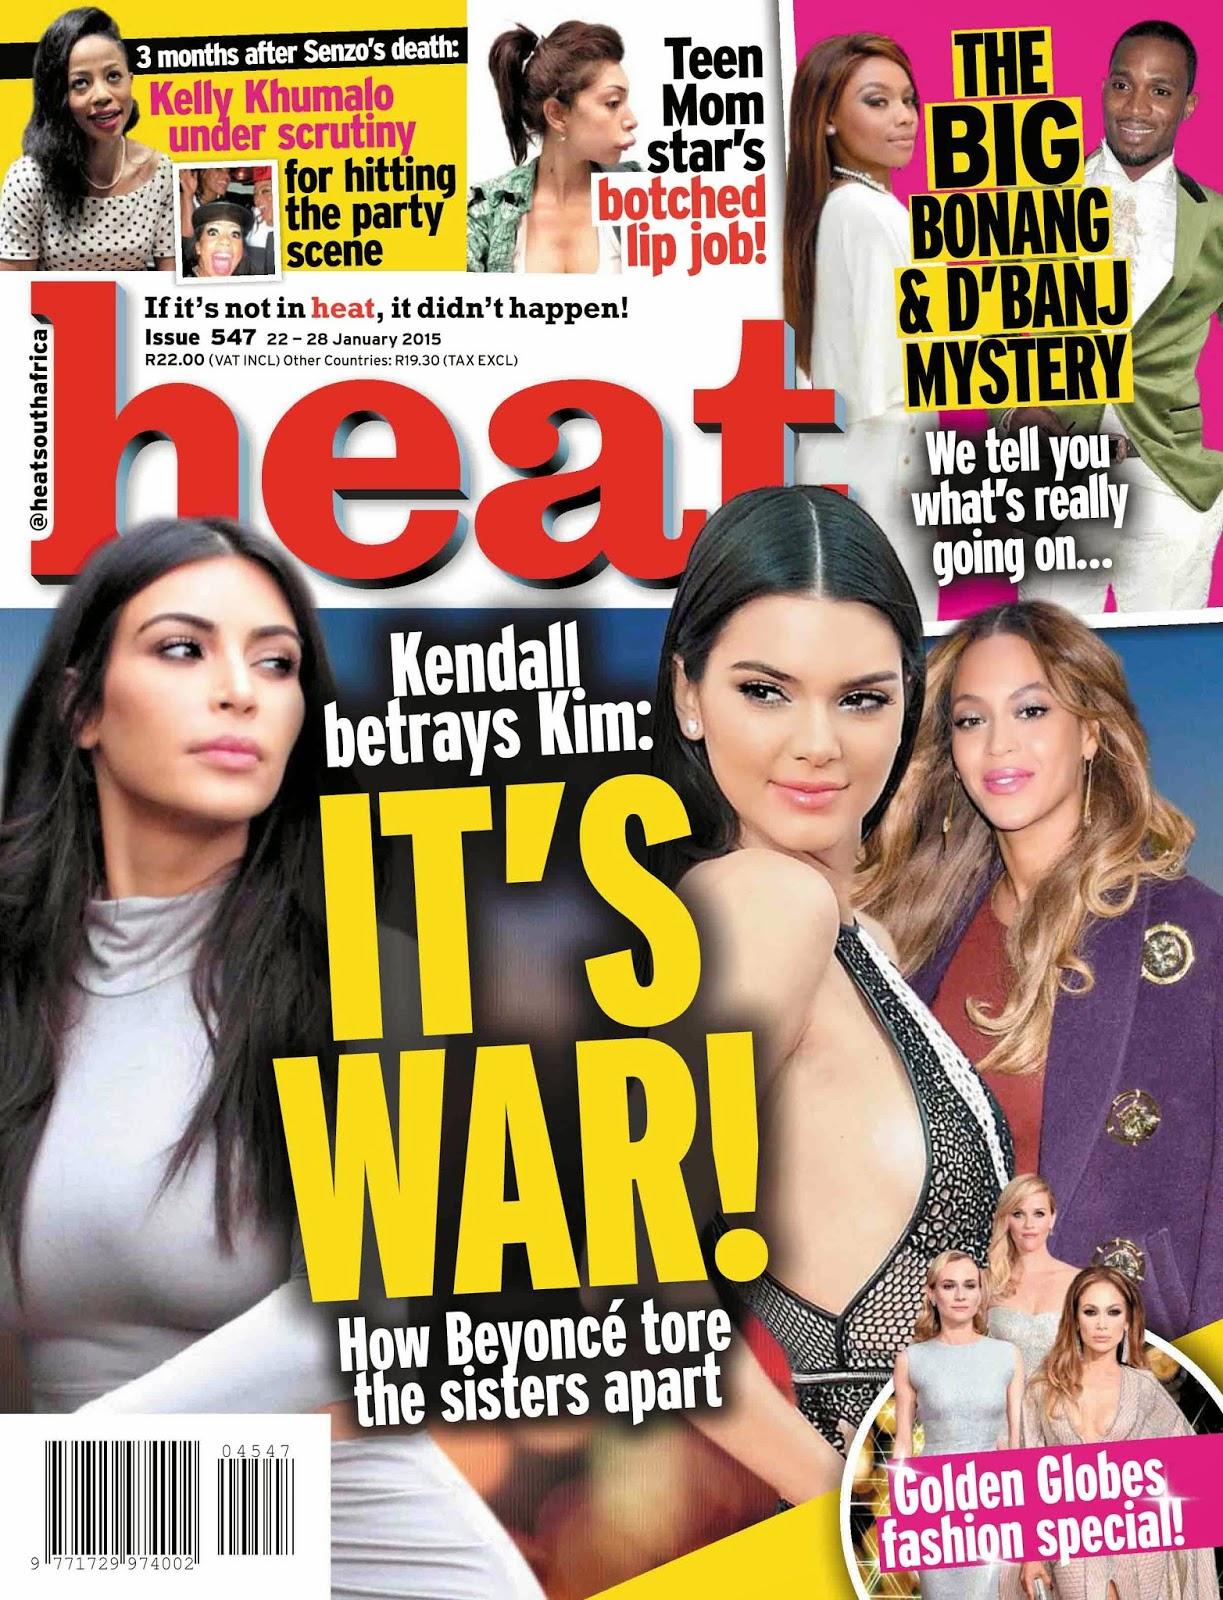 Kim Kardashian and Kendall Jenner - Heat, South Africa, January 2015